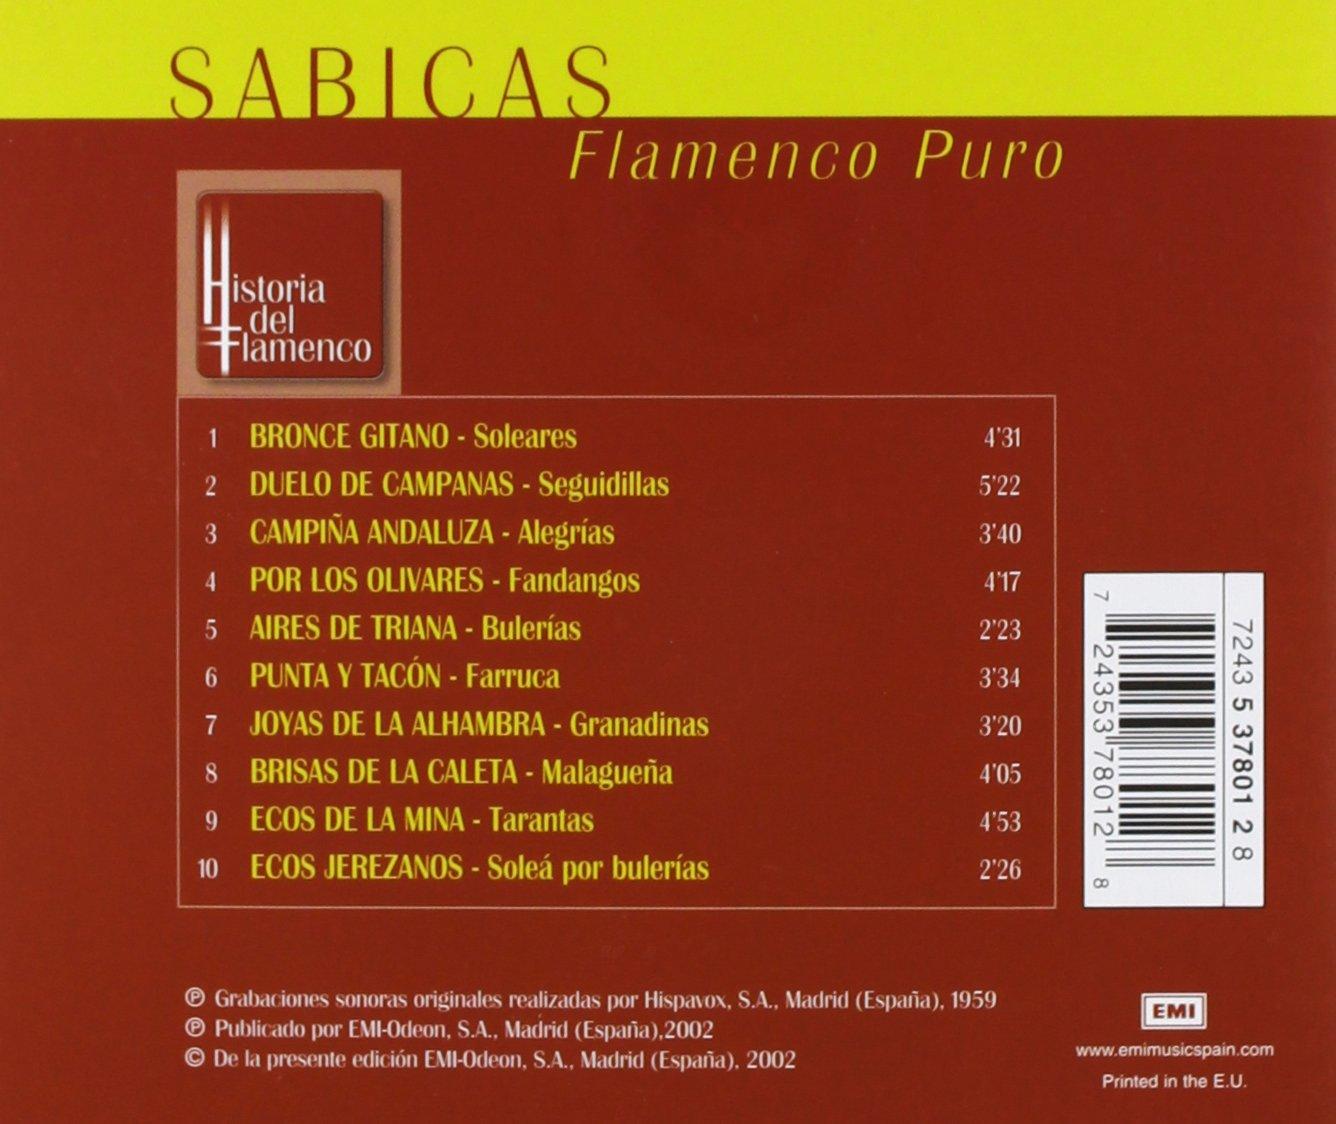 Flamenco Puro by Warner Spain